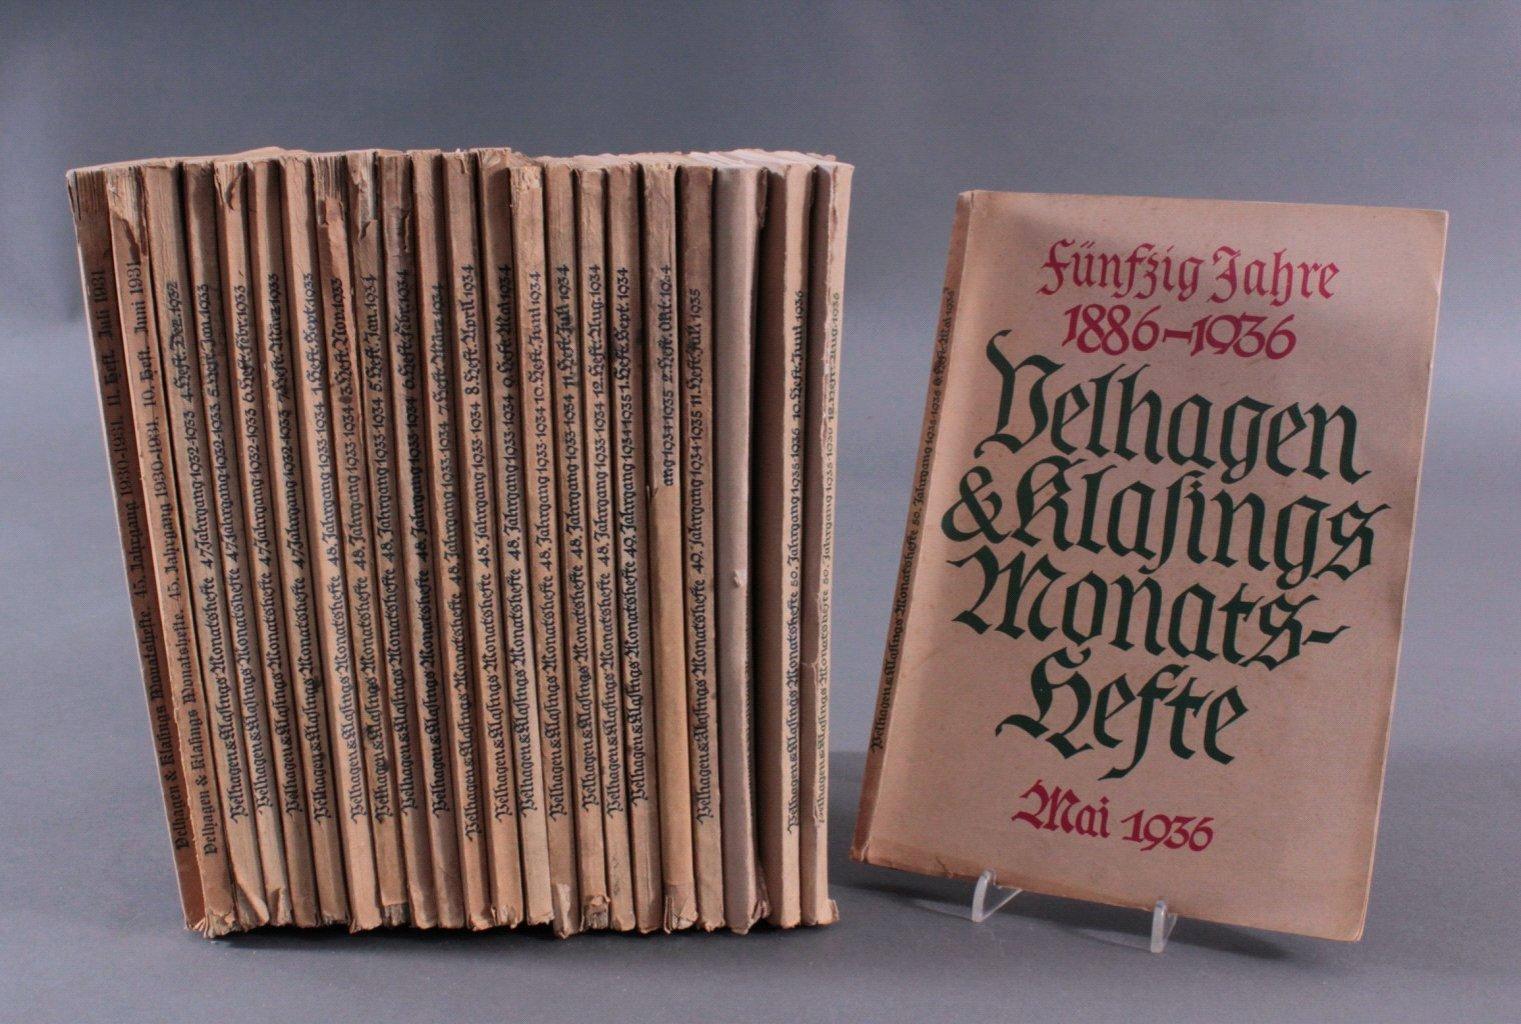 Velhagen & Klasings Monats Hefte